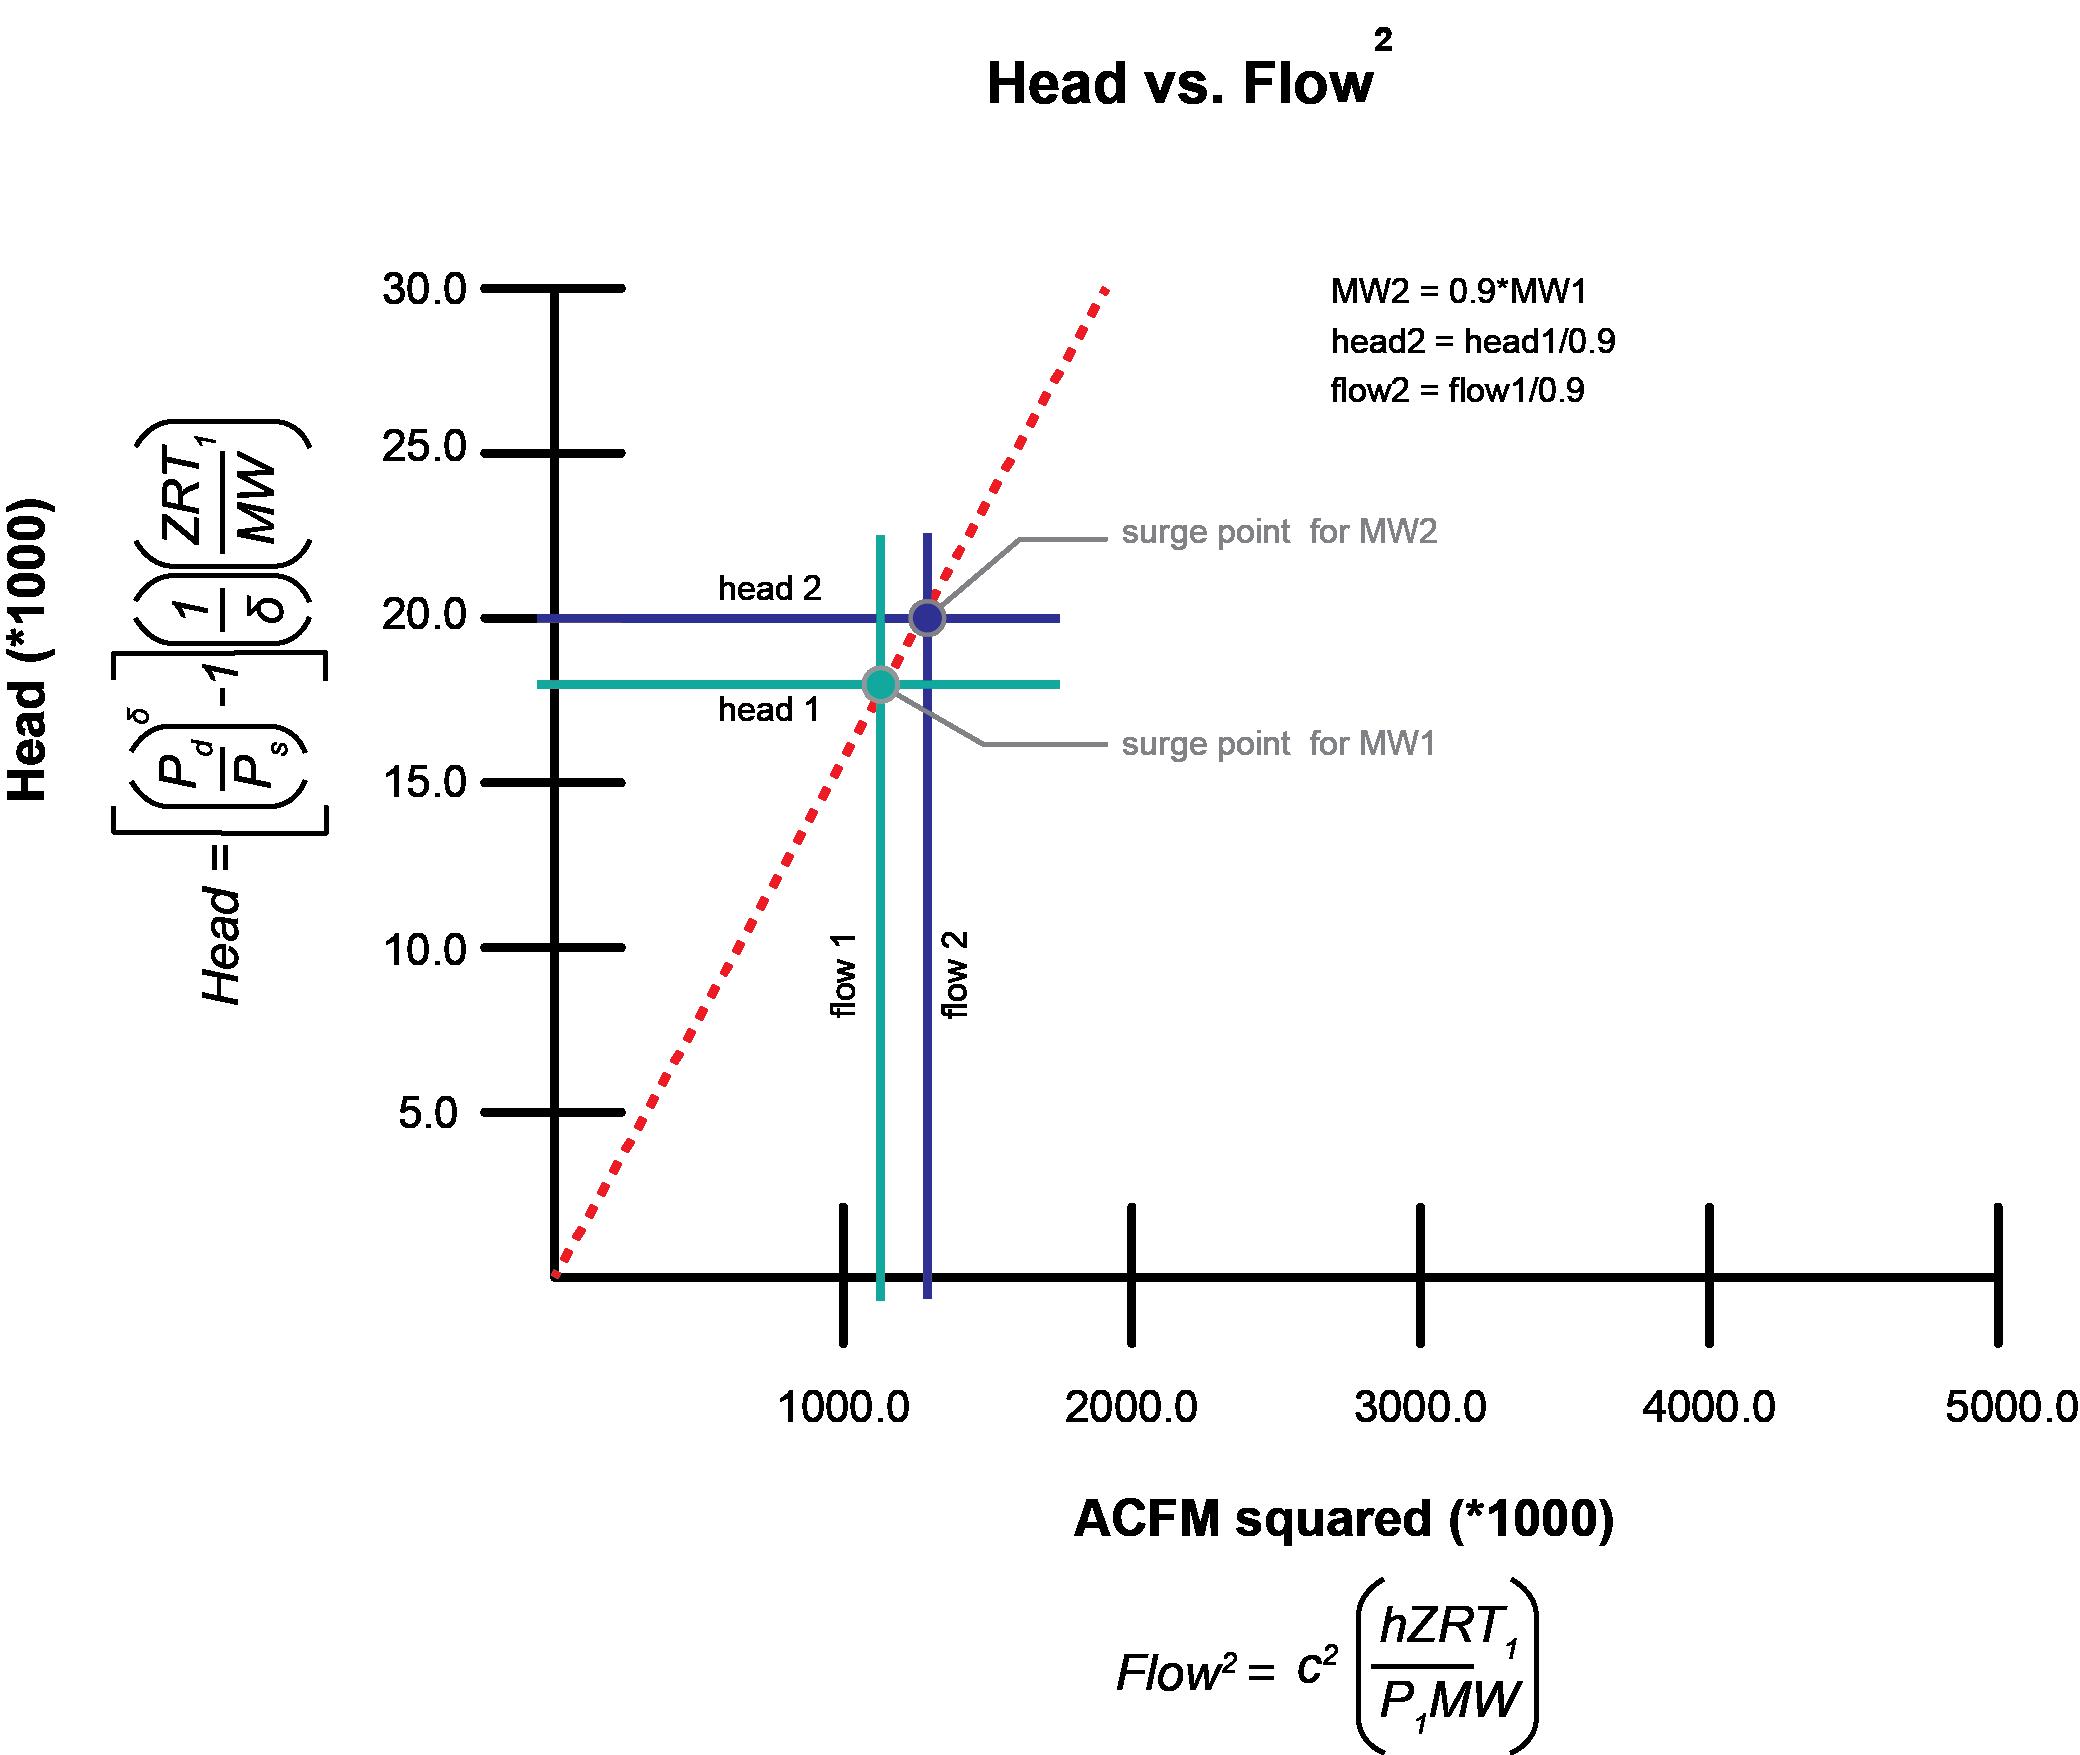 Head vs flow r1 0